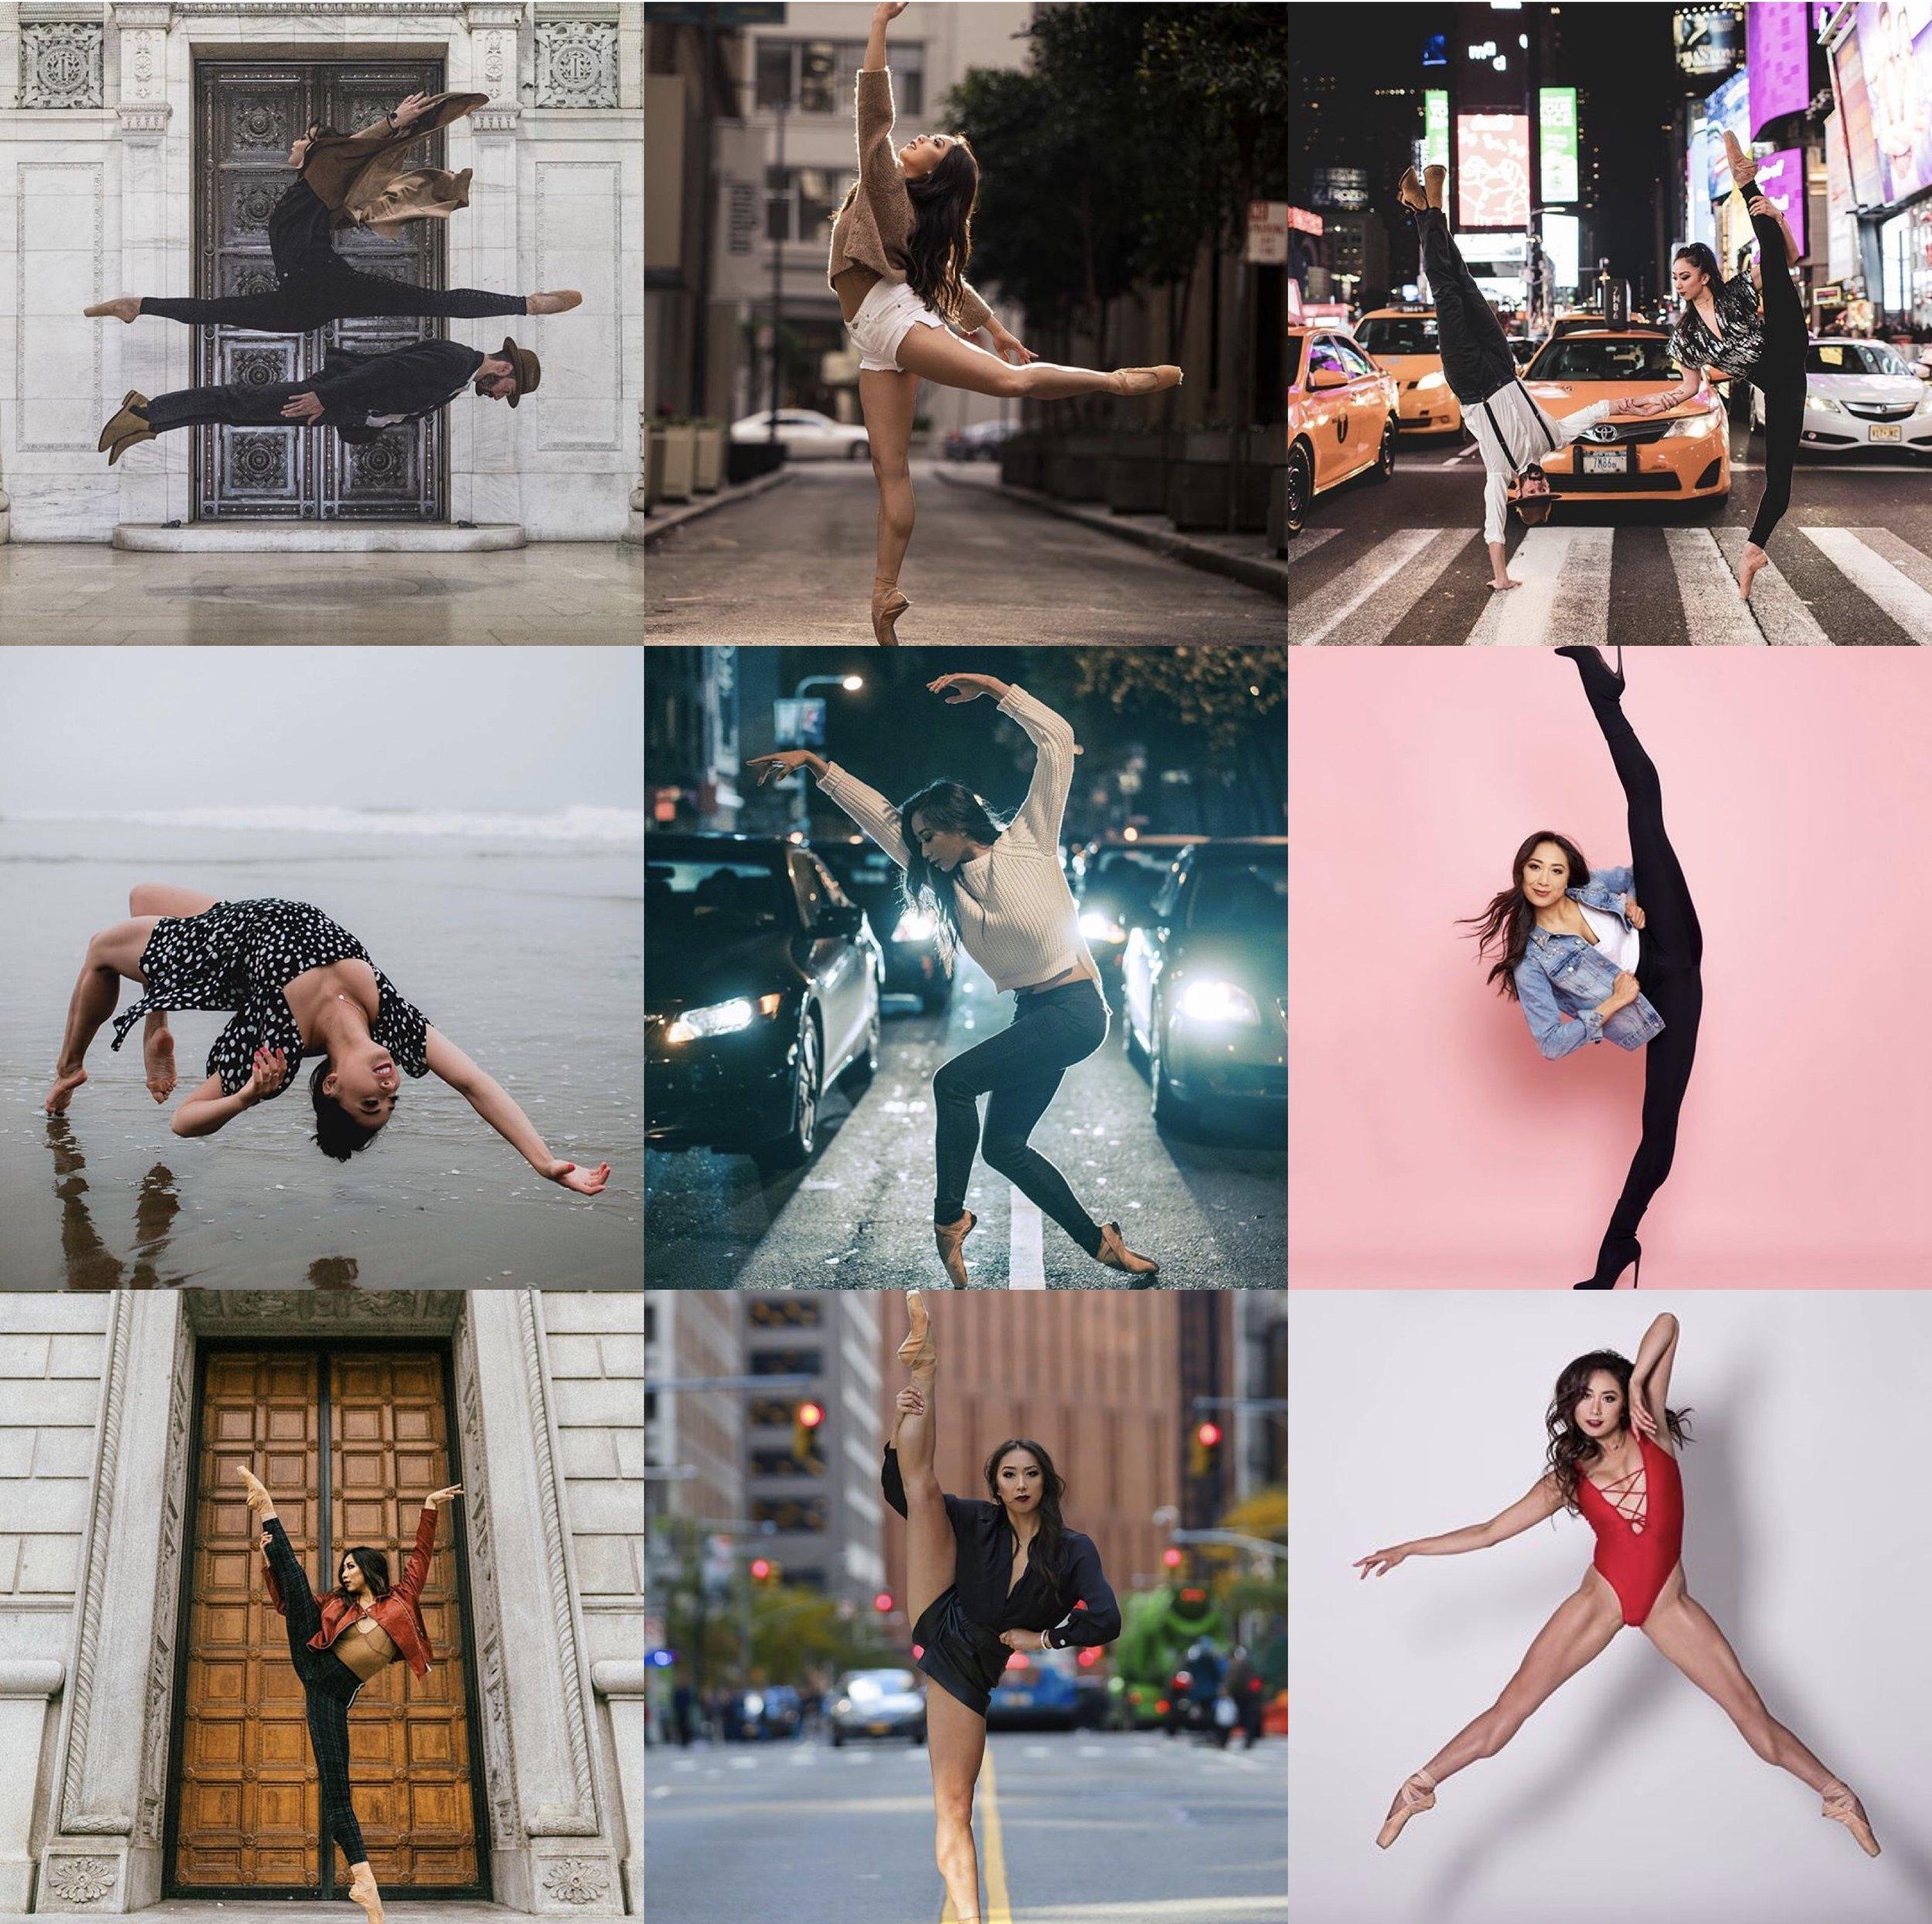 INSTAGAM'S BEST NINE OF 2018!      Photos by Kien Quan, Matthew Carlson, Julian Zabala, Nathan Carlson, Justin Patterson, James Jin, David Tufino, and Karolina Knepaite